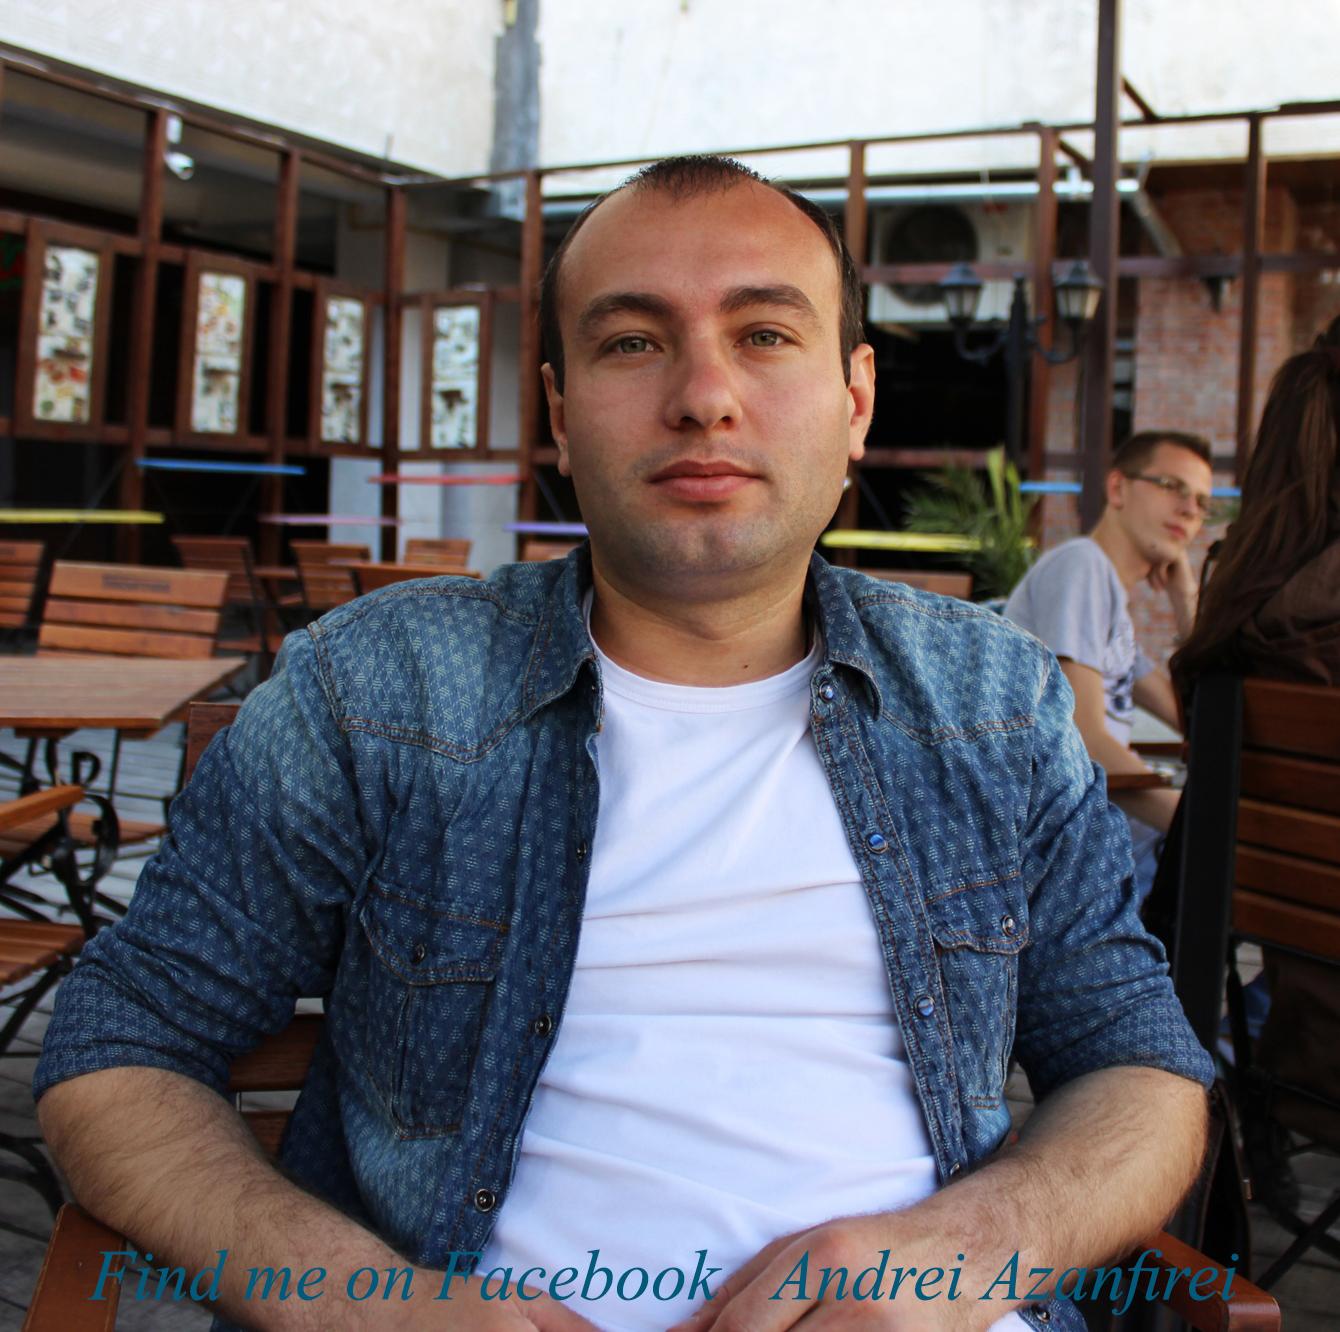 Andrei-Azanfirei's Profile Picture